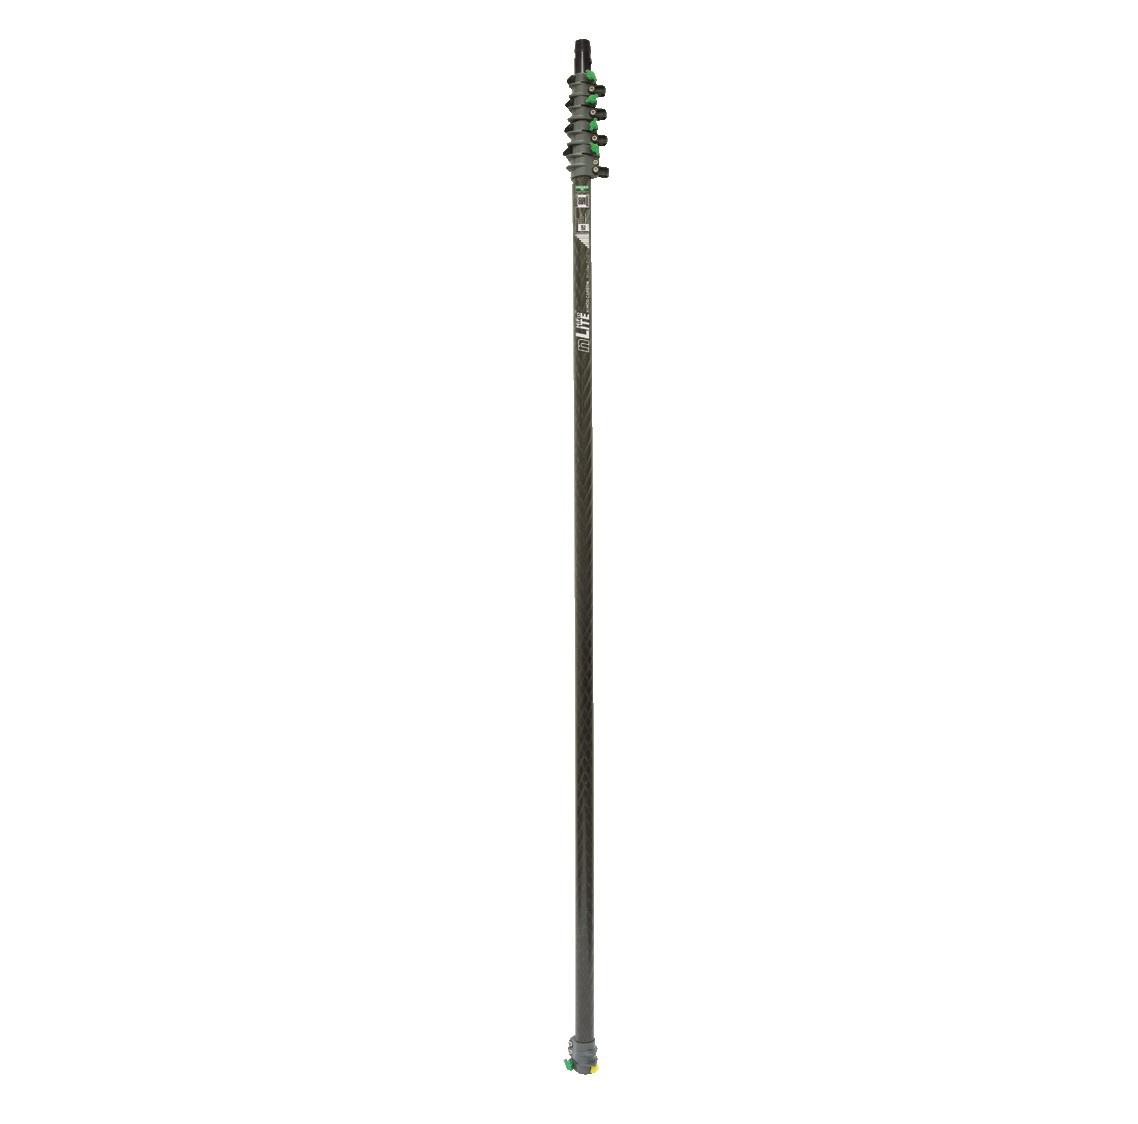 Unger HiFlo nLite - HiMod Carbon Master Pole 22ft